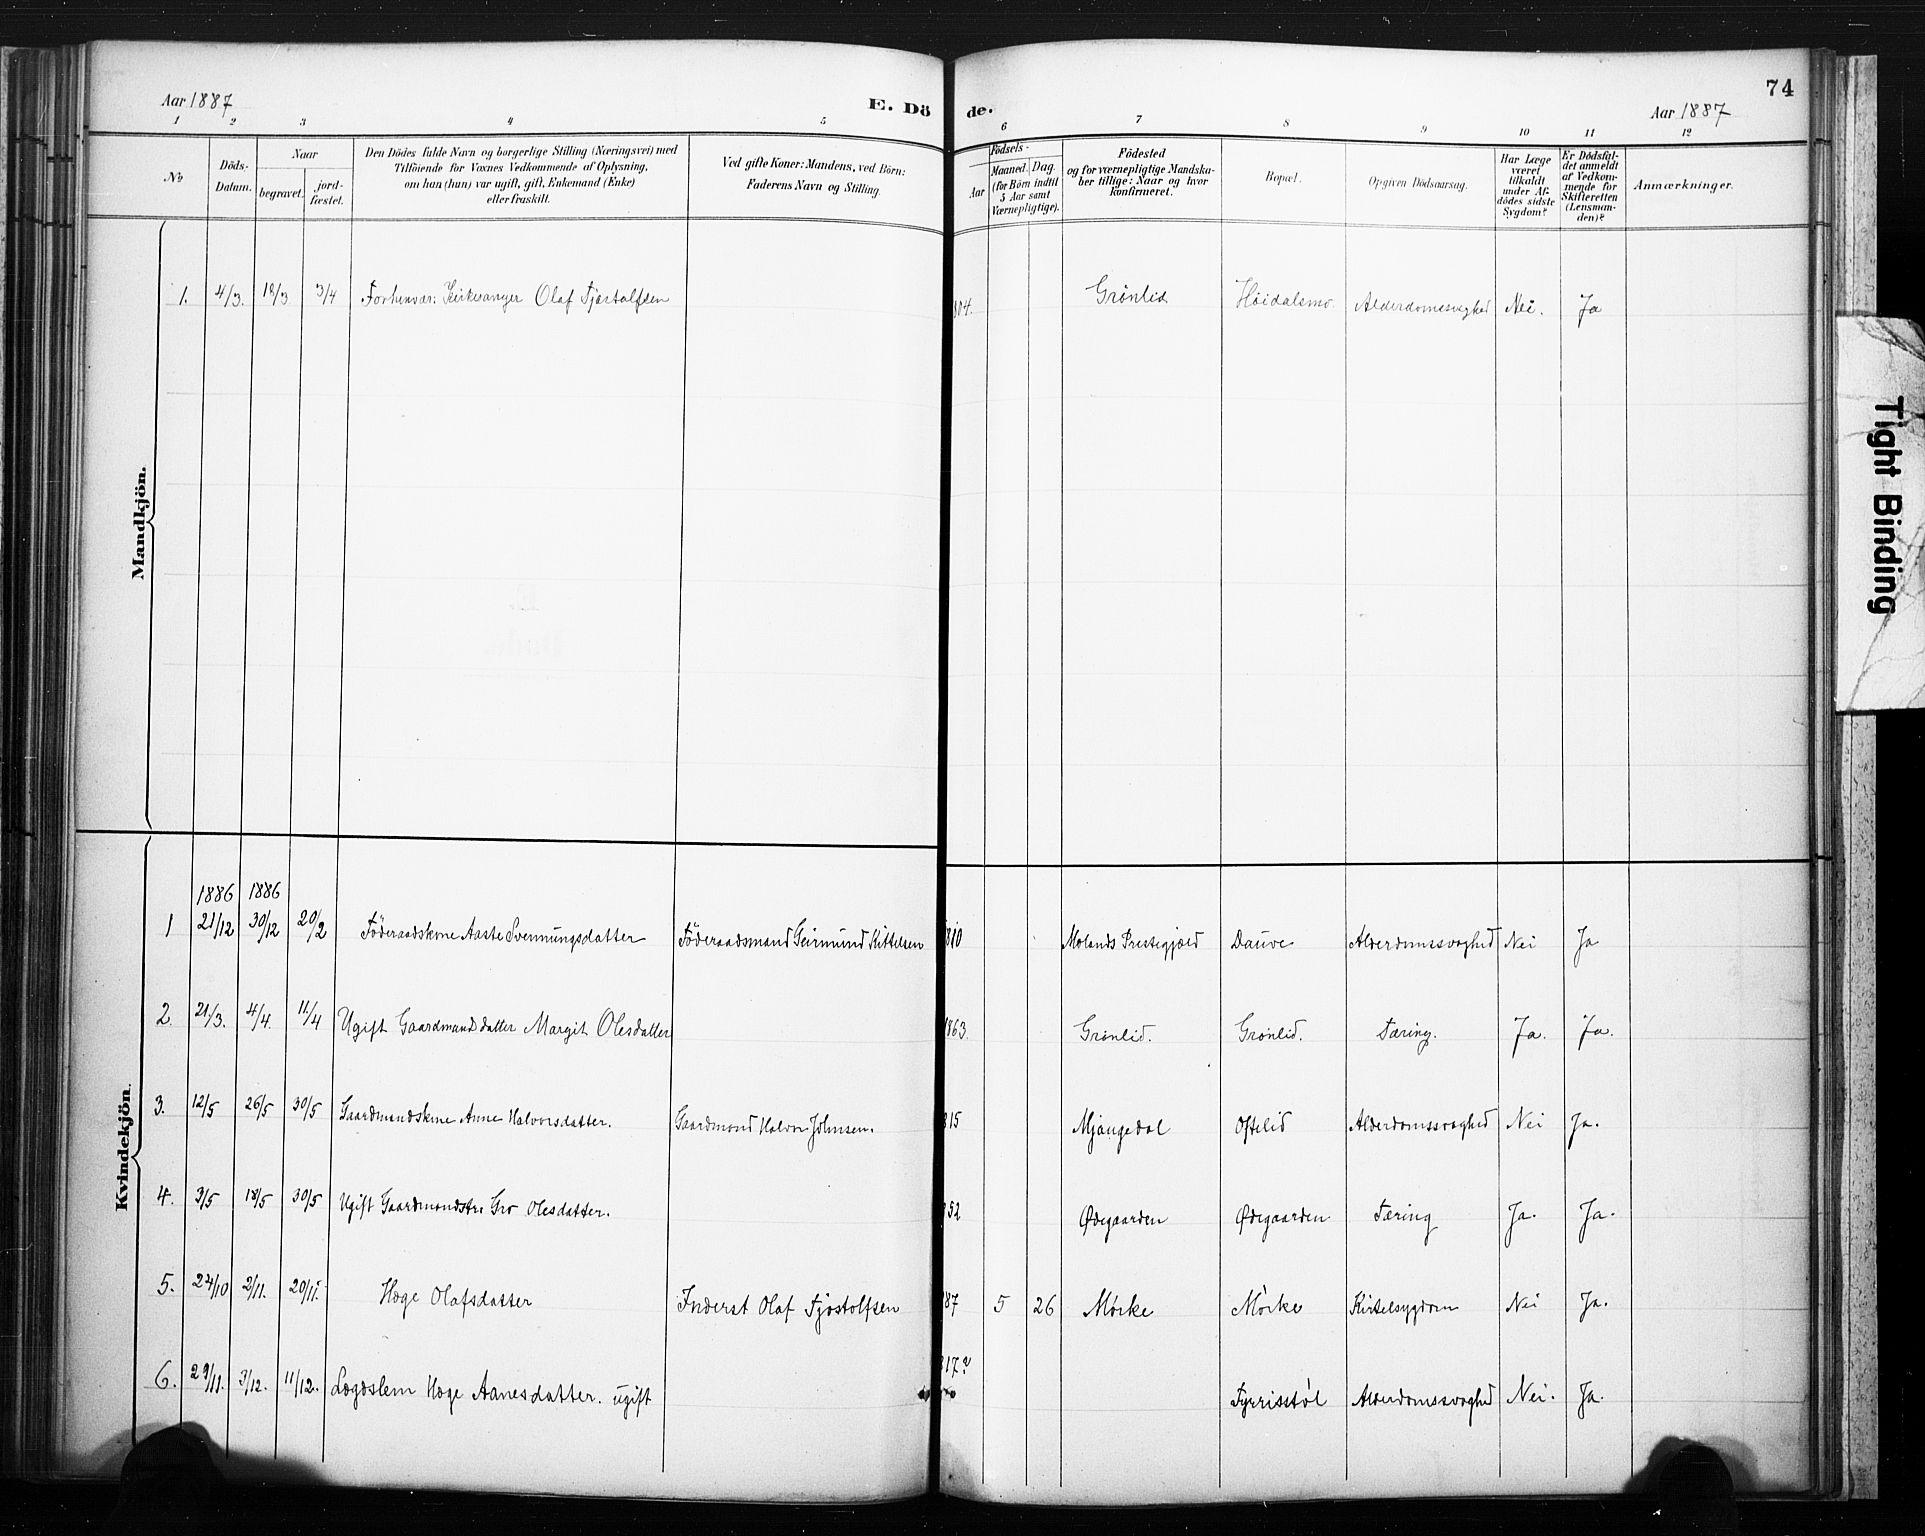 SAKO, Lårdal kirkebøker, F/Fc/L0002: Ministerialbok nr. III 2, 1887-1906, s. 74